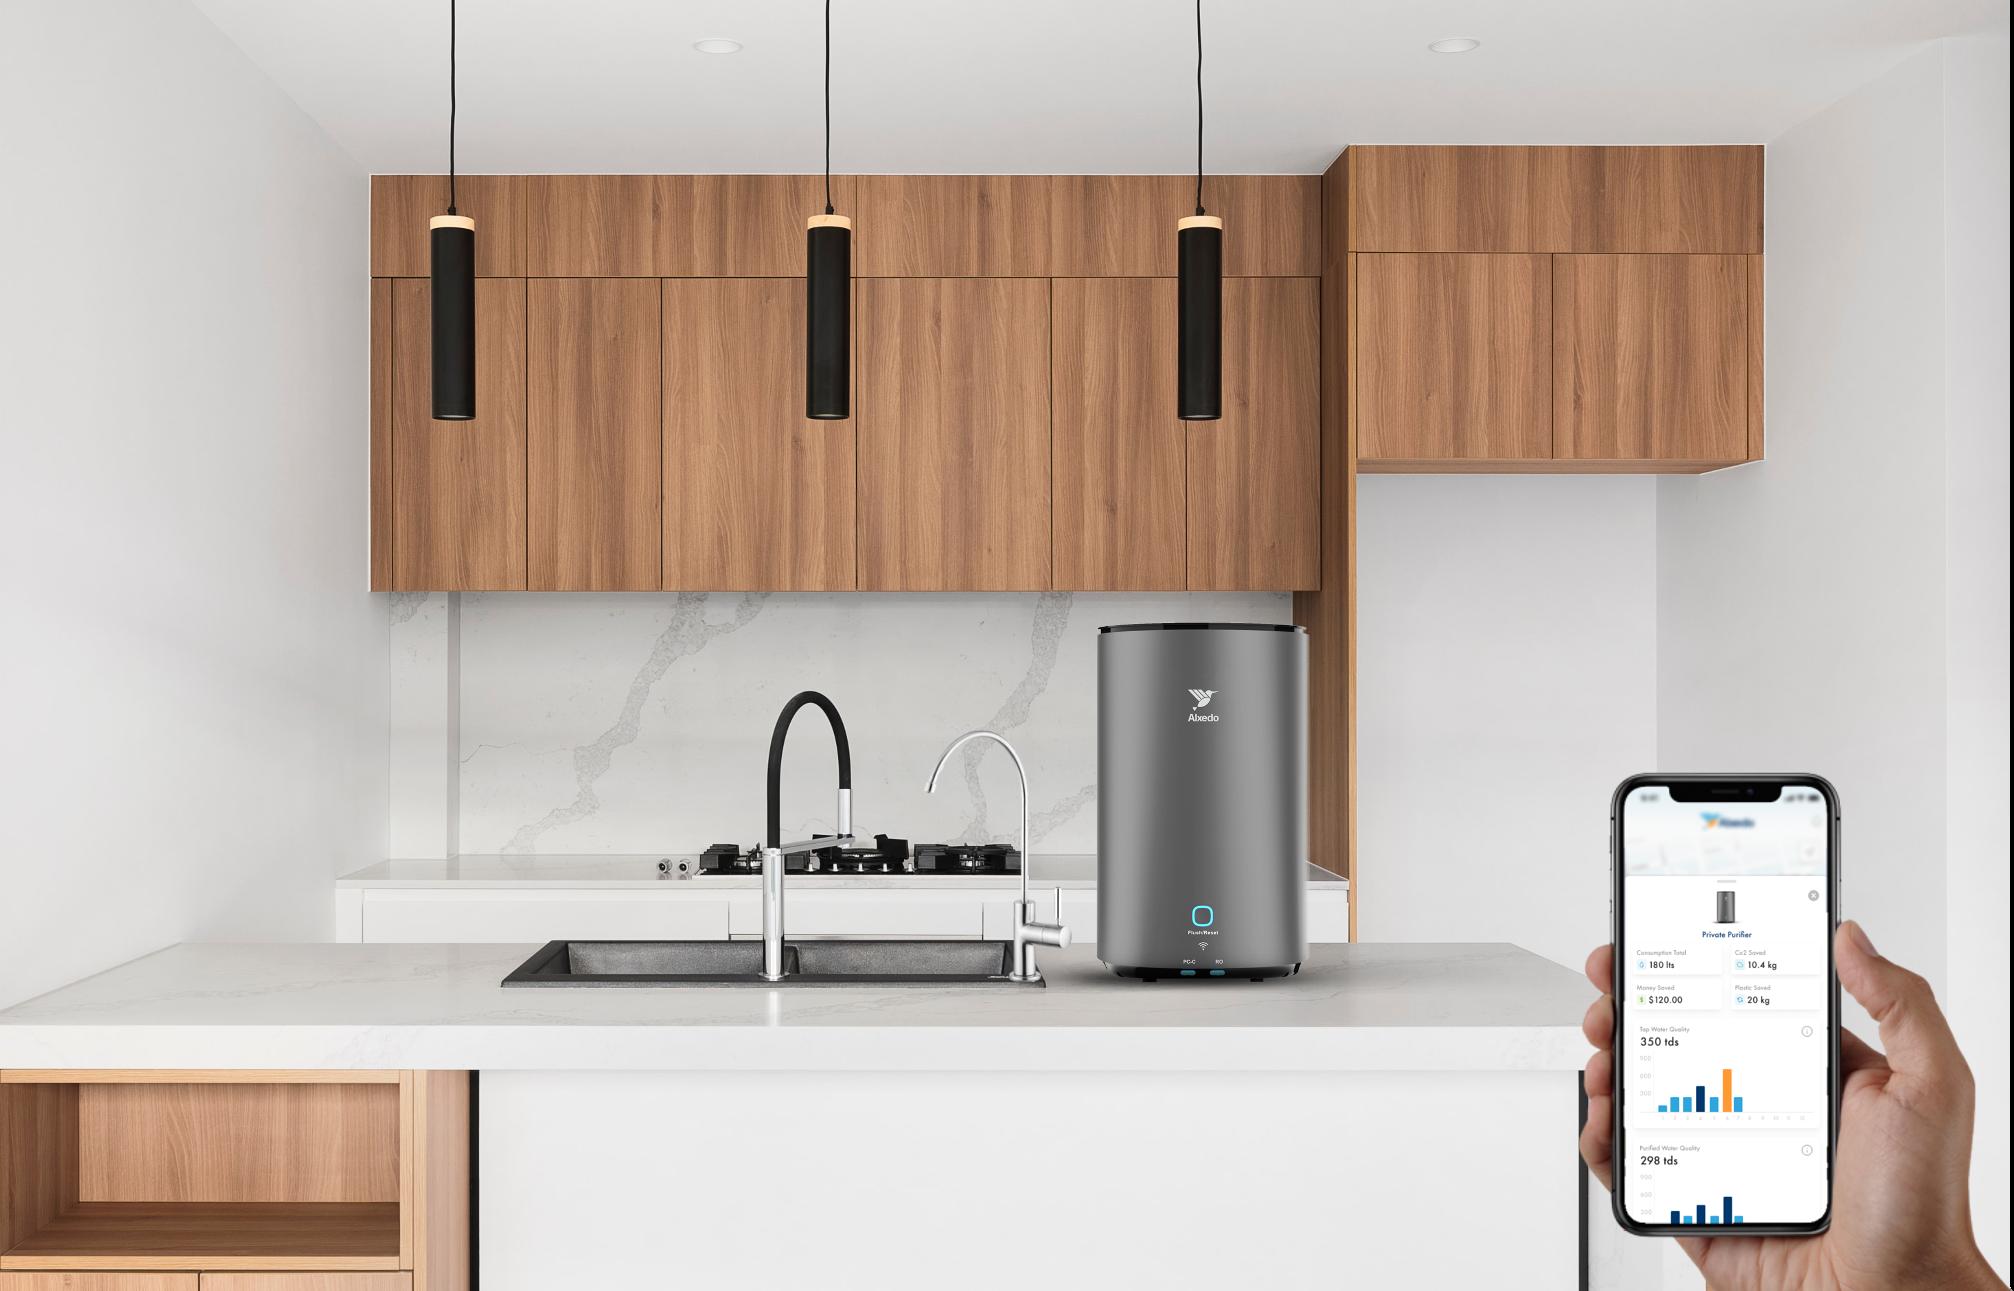 Alxedo Smart Water Purifier and App